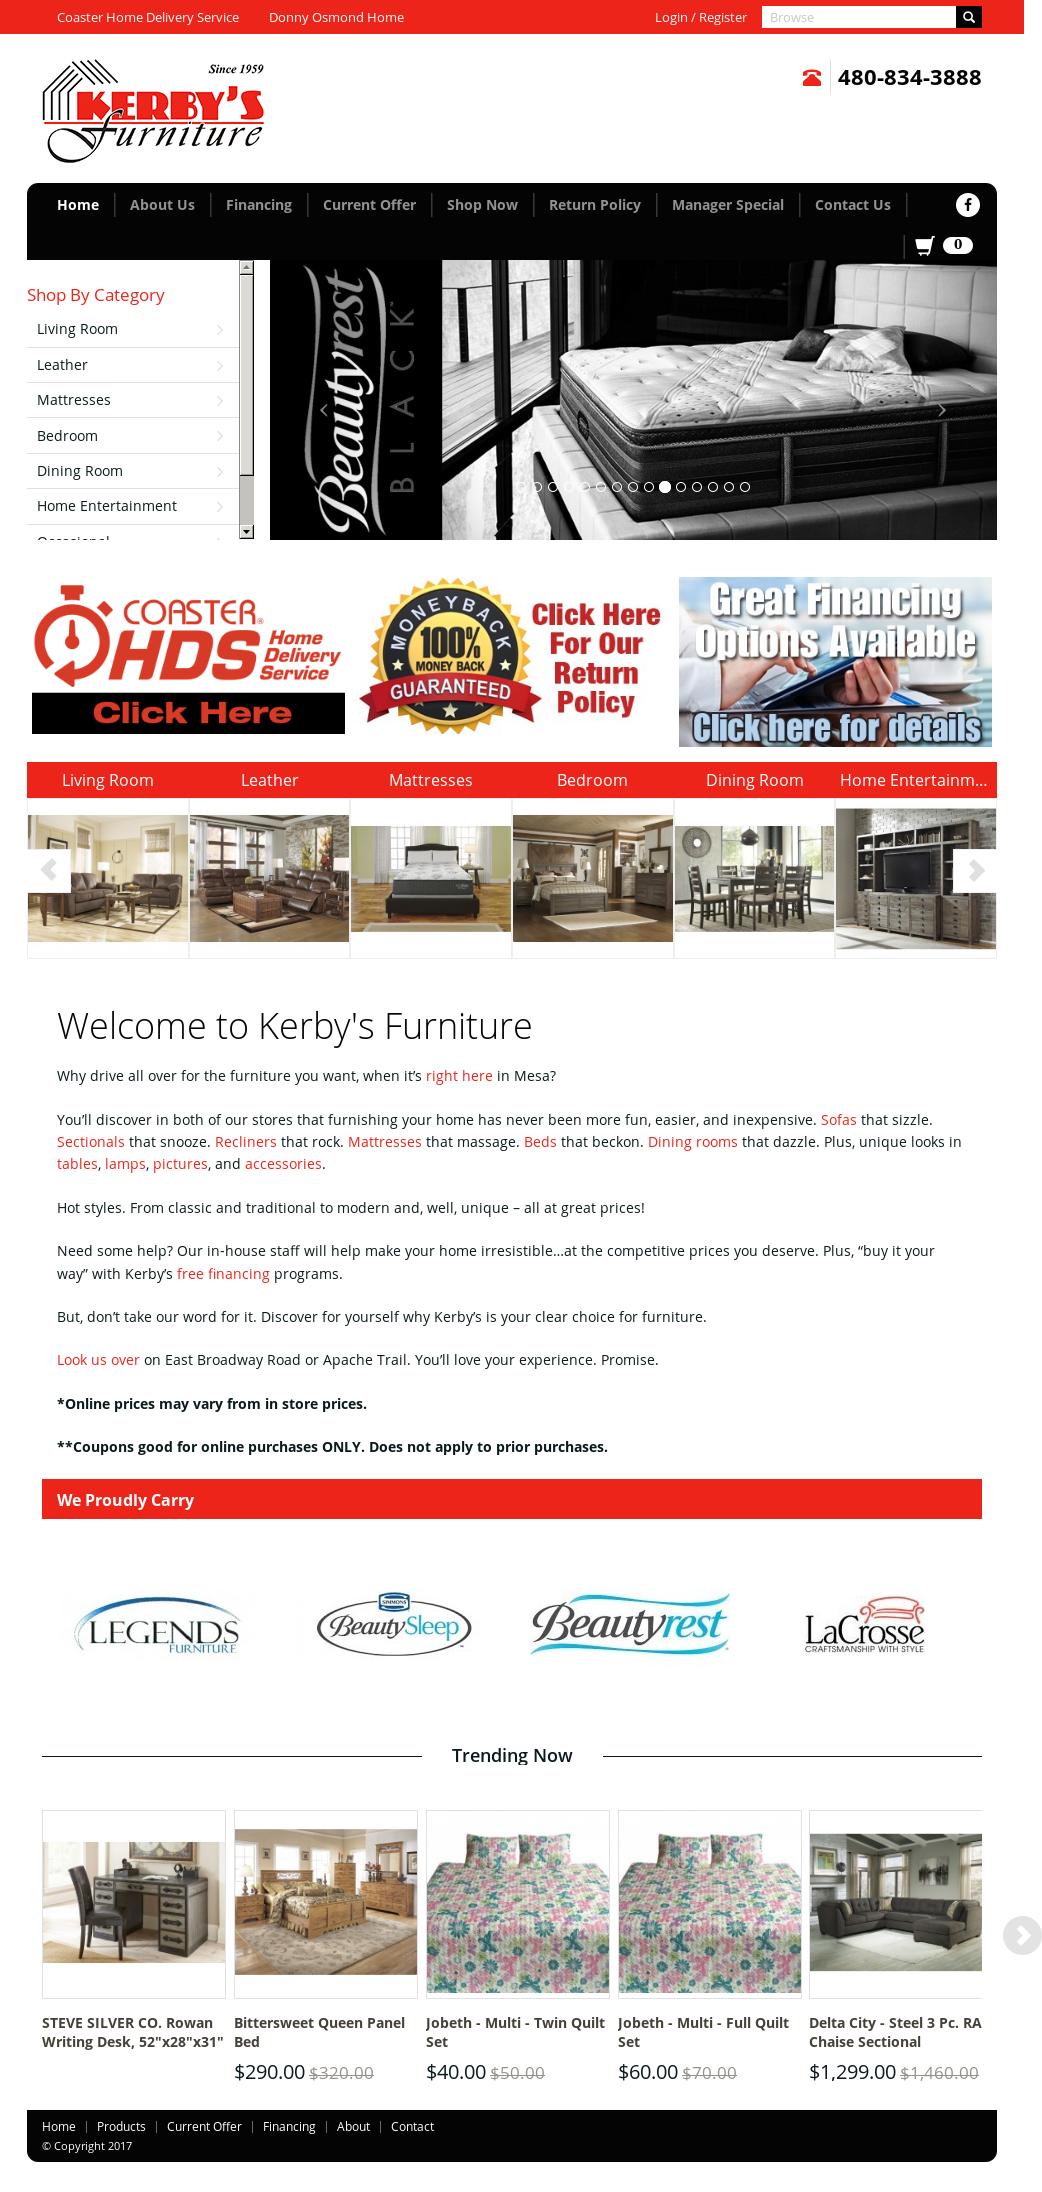 Kerbyu0027s Furniture Website History